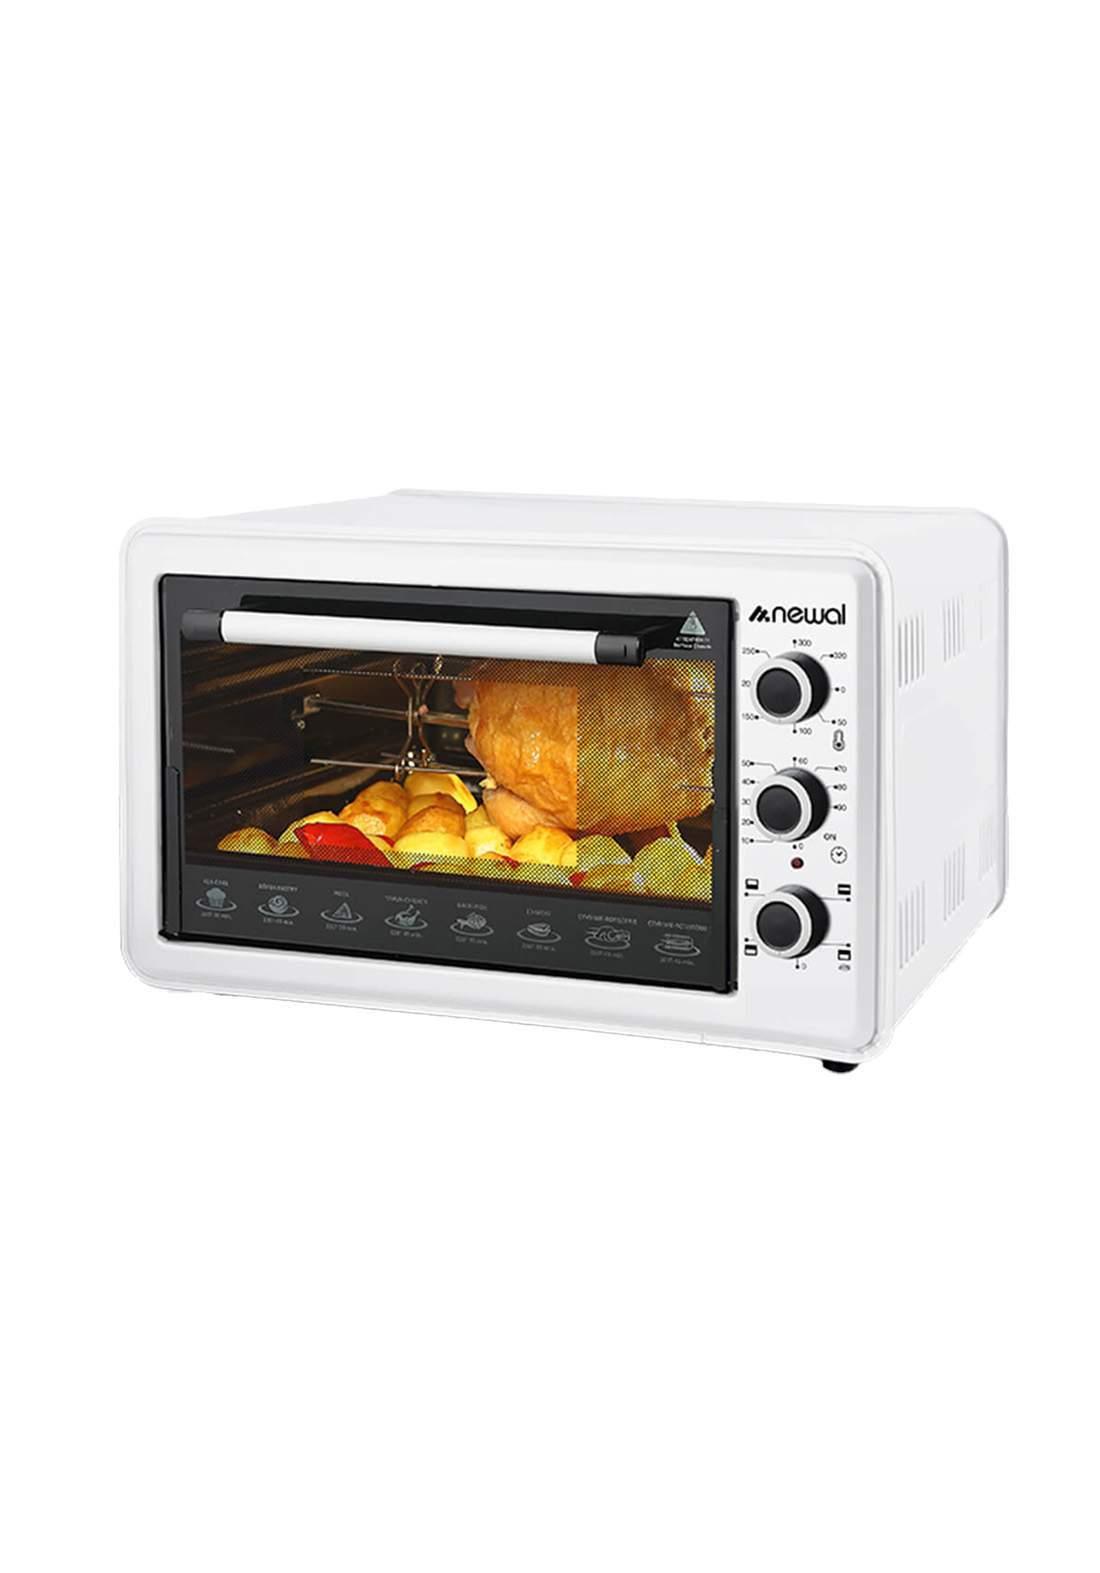 Newal Mini Oven 36L MOV-365-01 - White فرن كهربائي